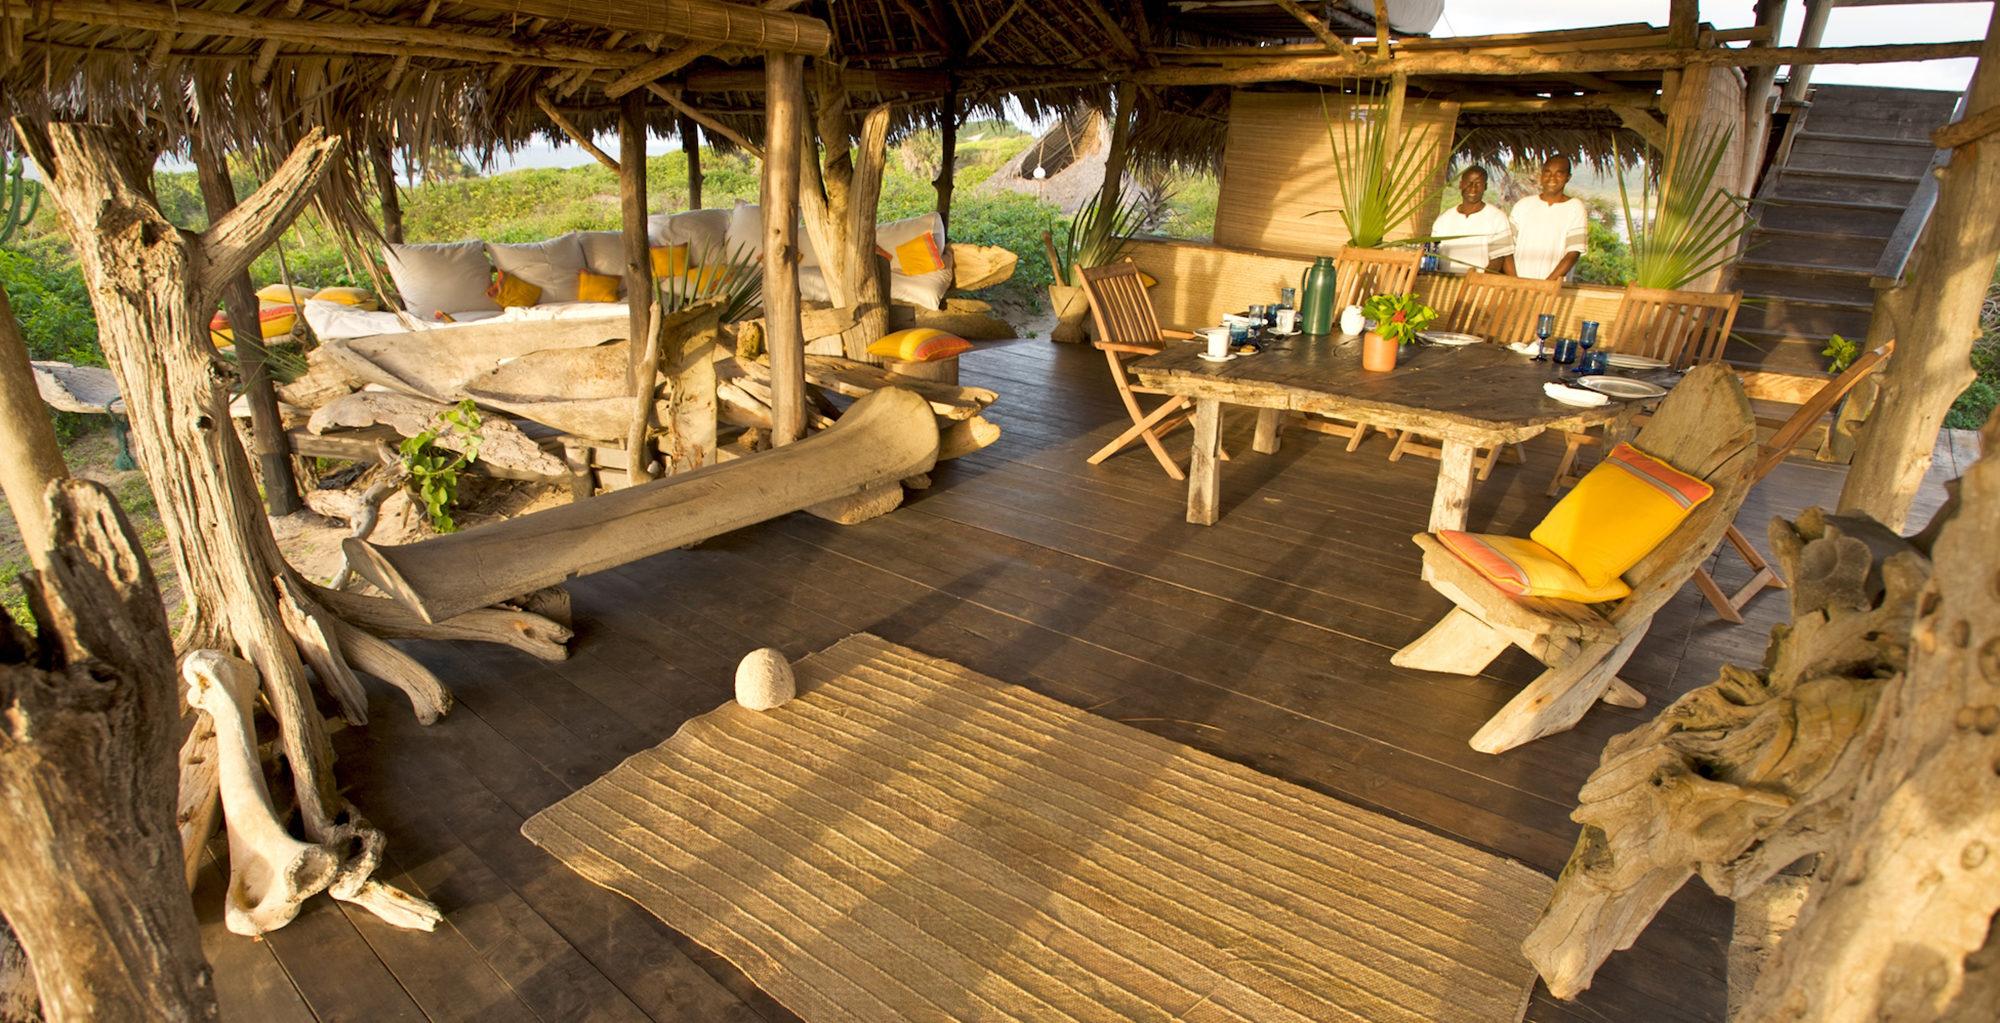 Kenya-Tana-Delta-Camp-Living-Room